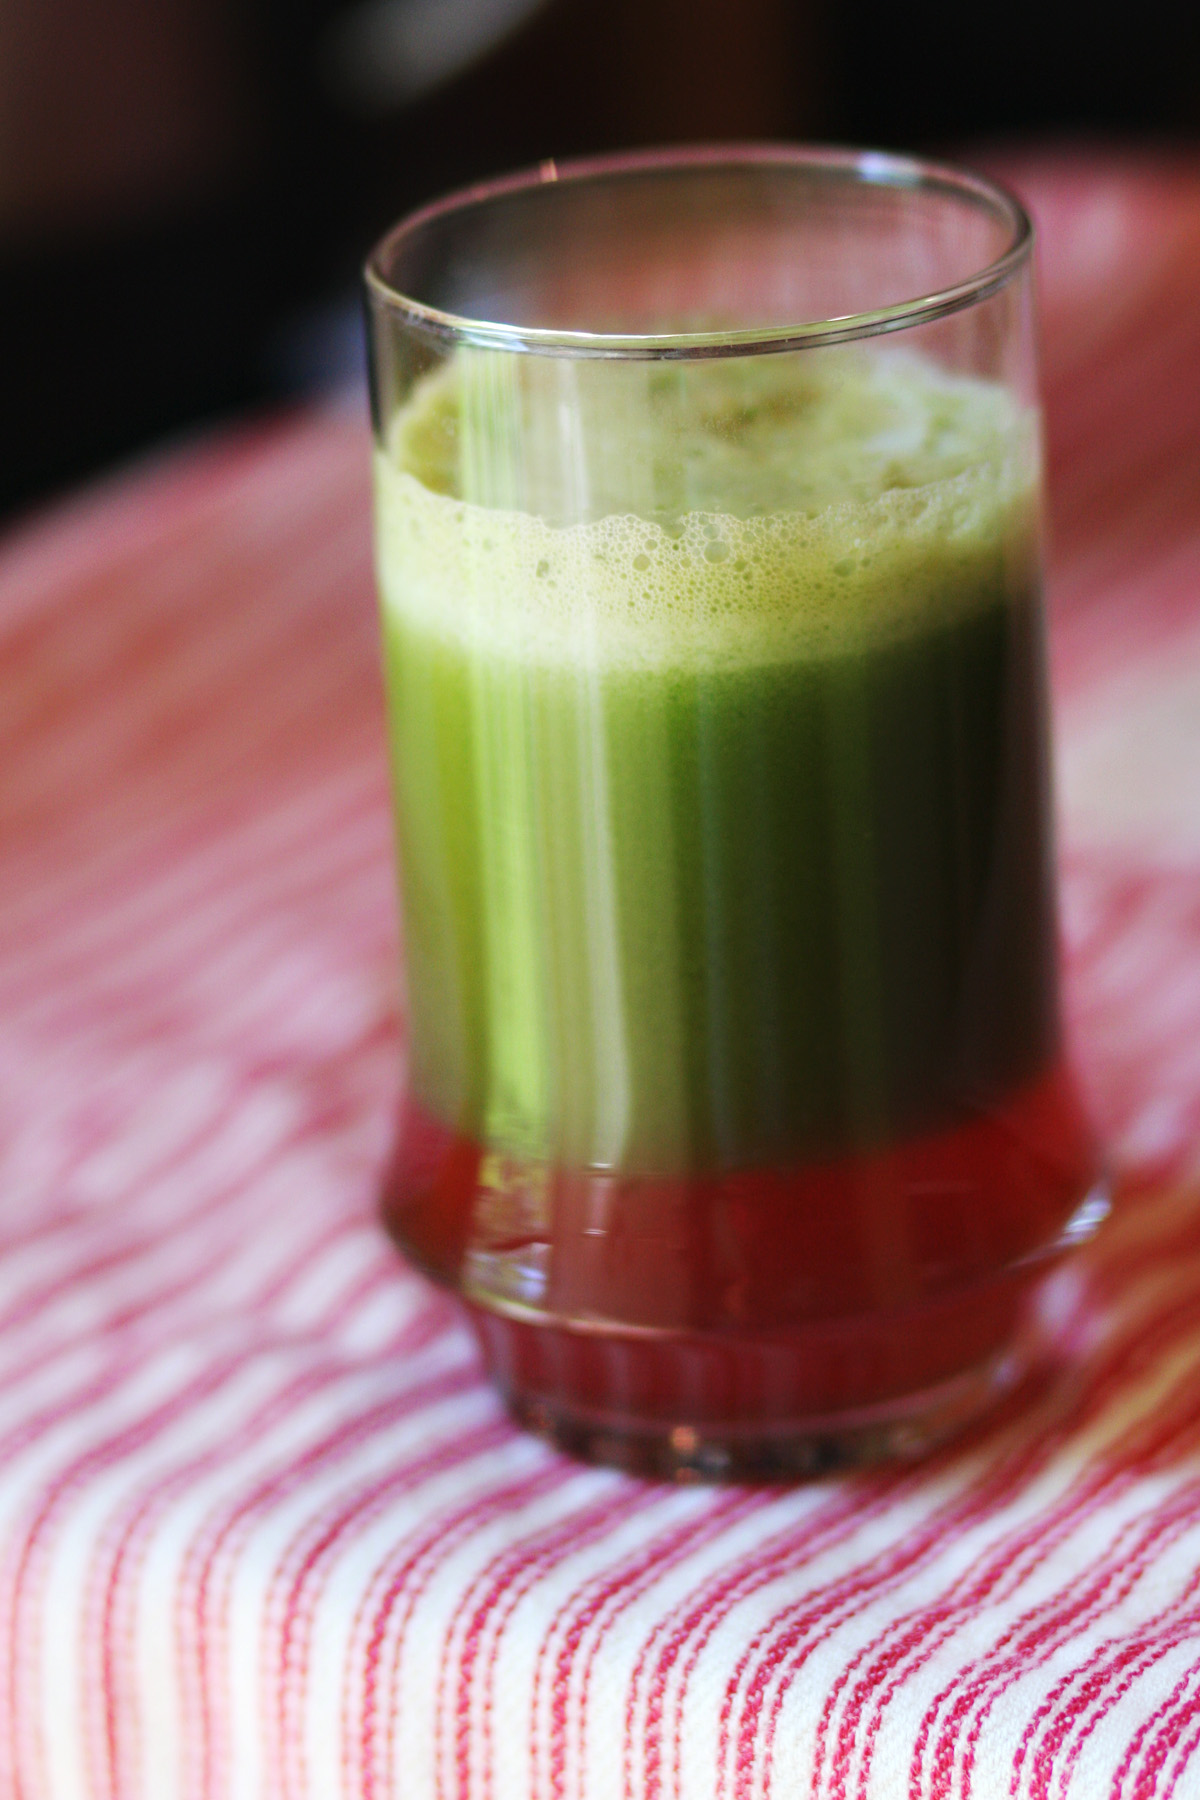 Green Lemonade with a Twist